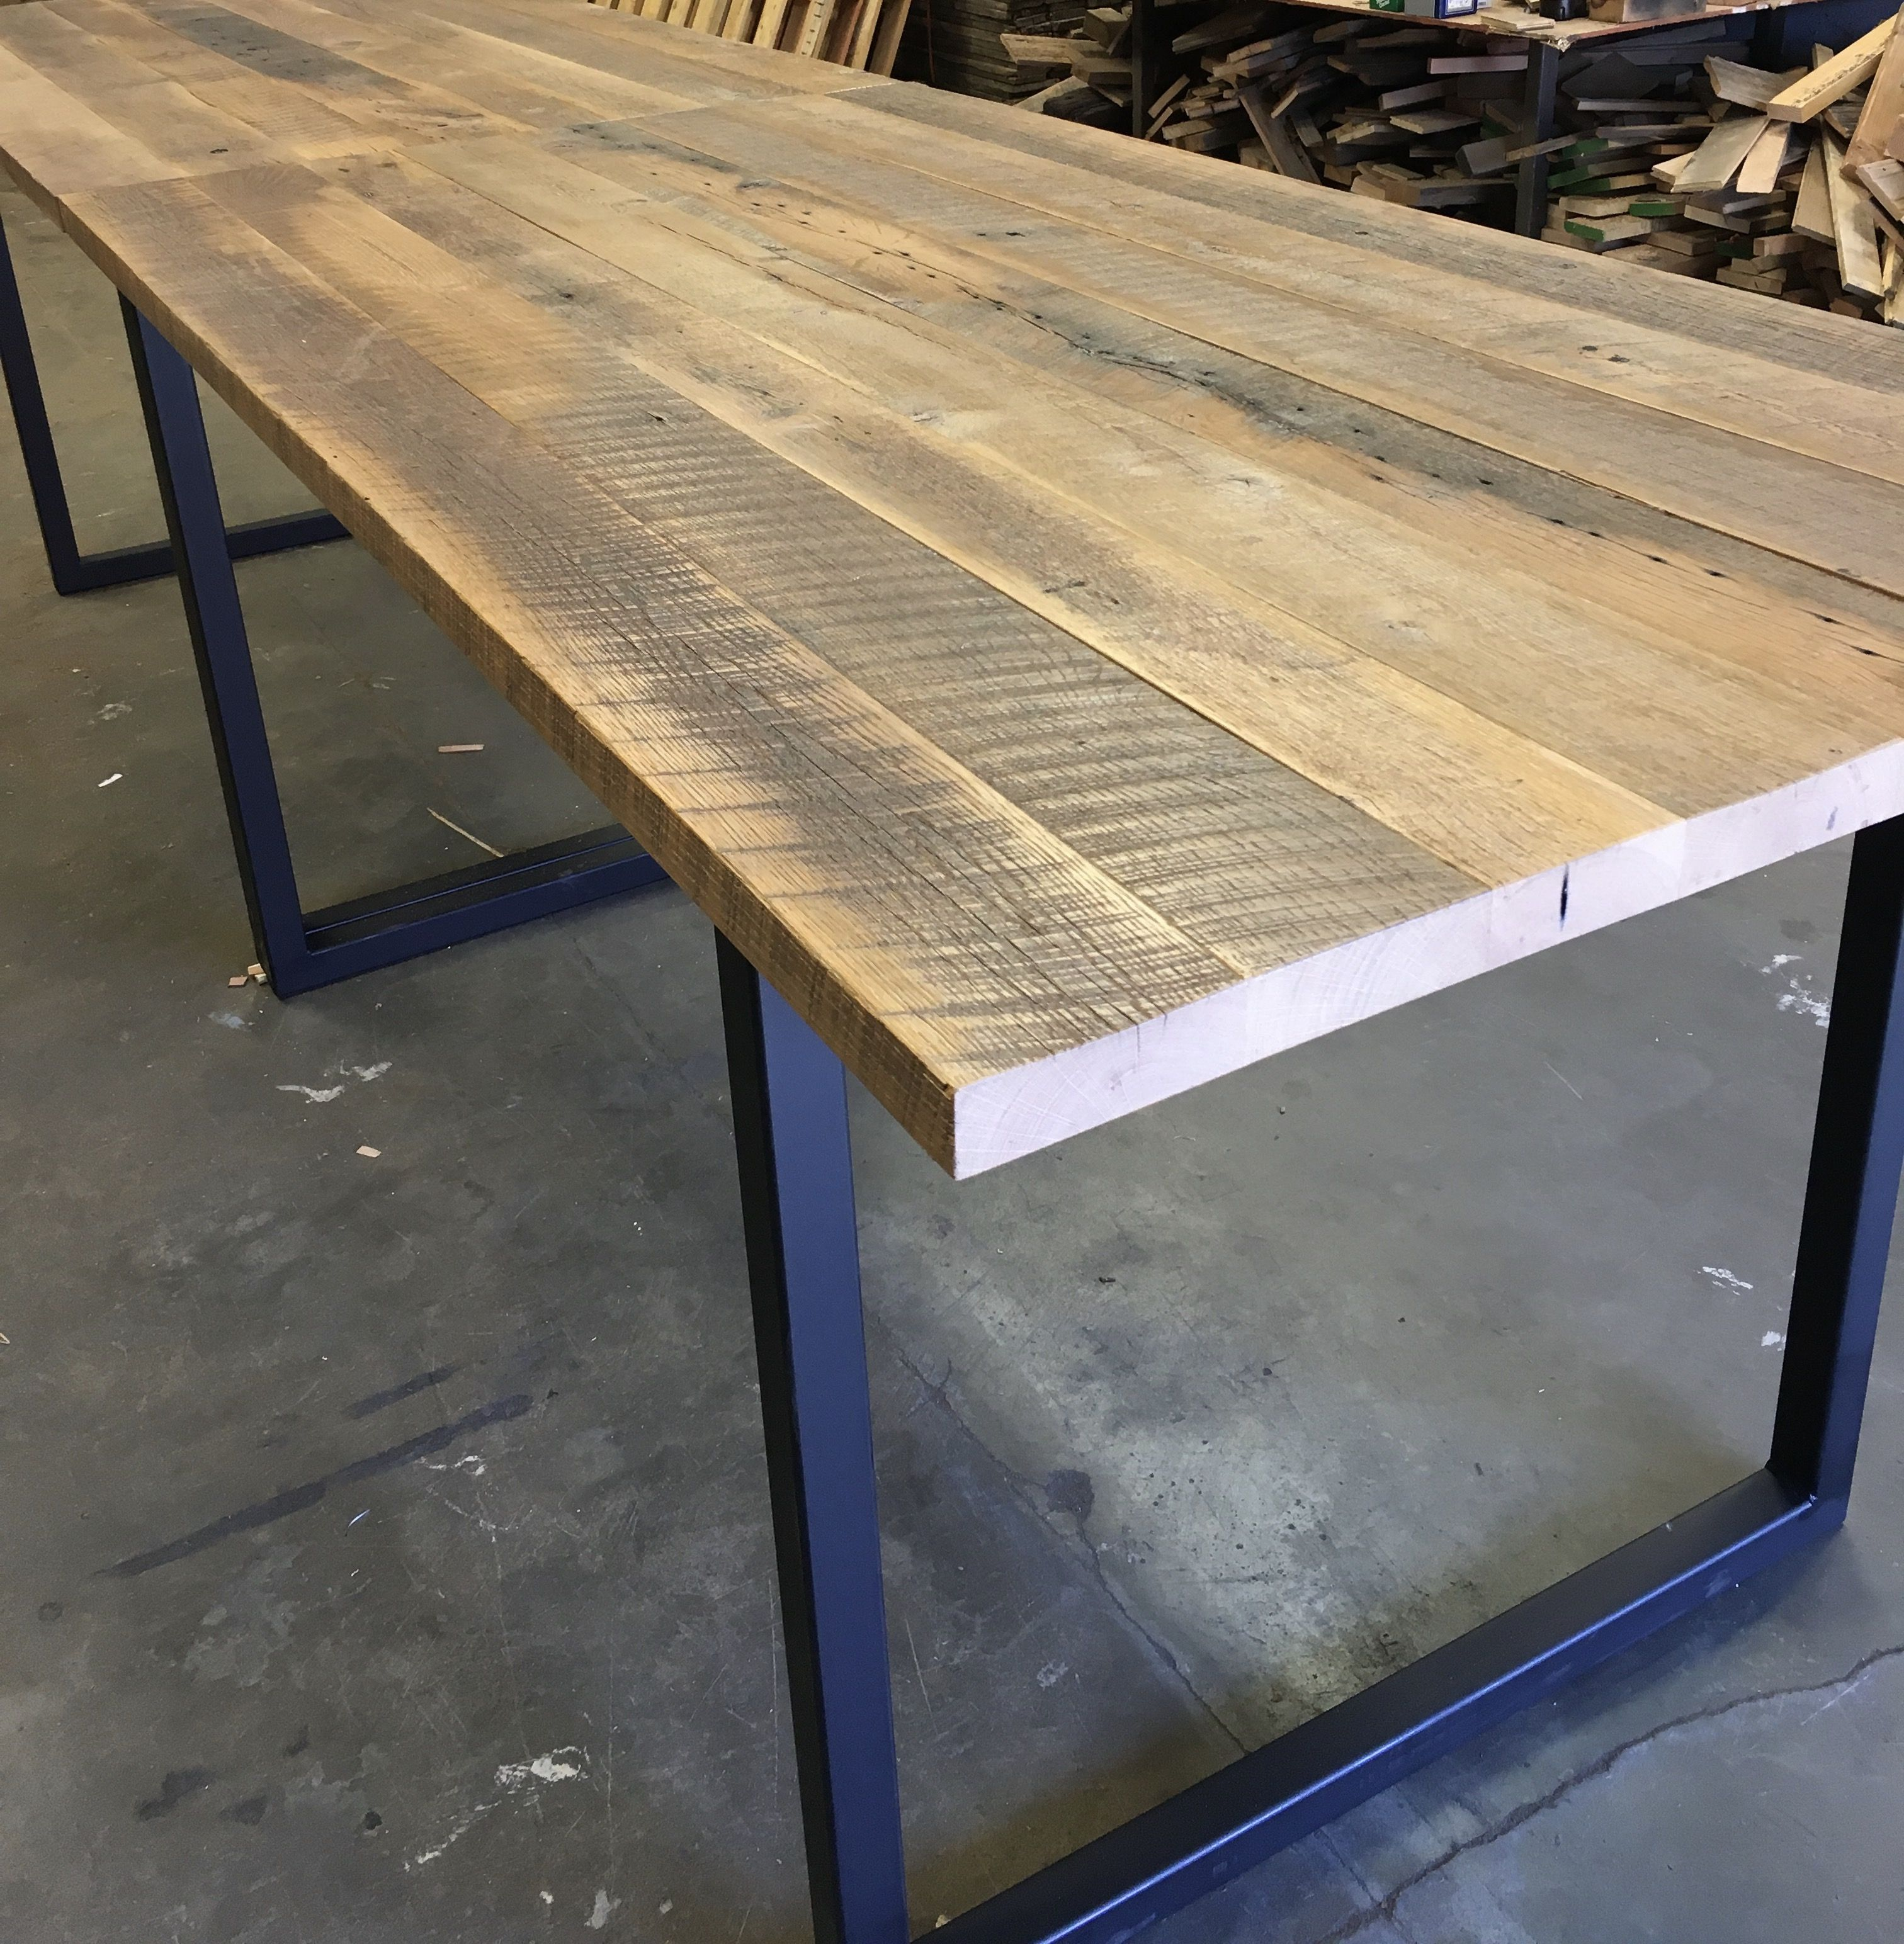 Reclaimed Wood Tables Reclaimed Wood Restaurant Reclaimed Wood